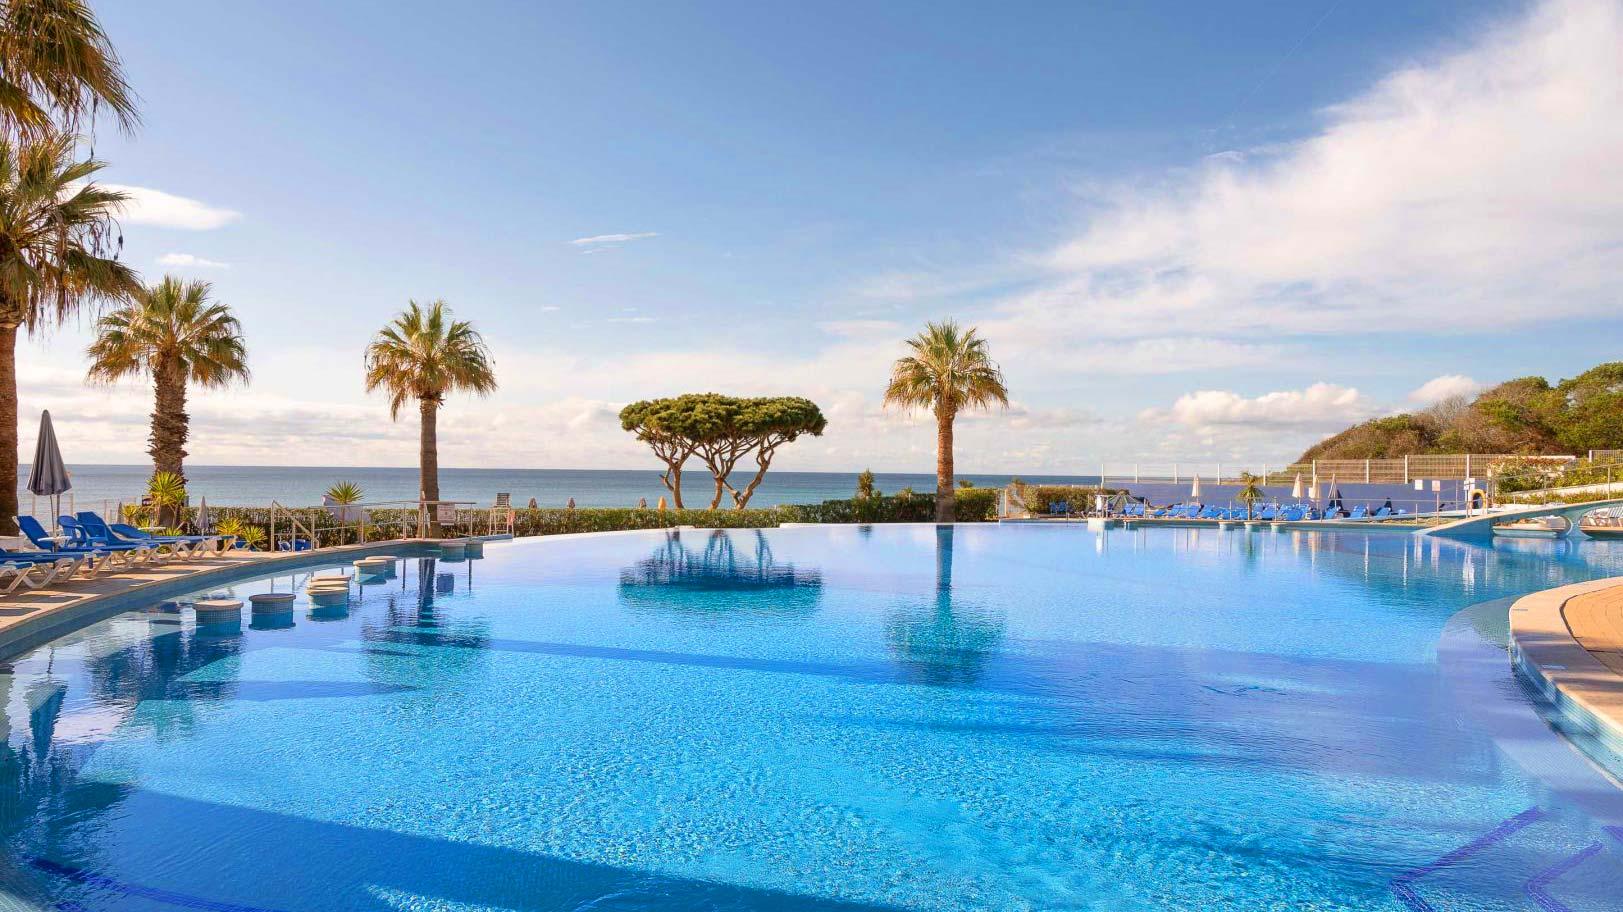 Grand Muthu Oura View Beach Club - Algarve